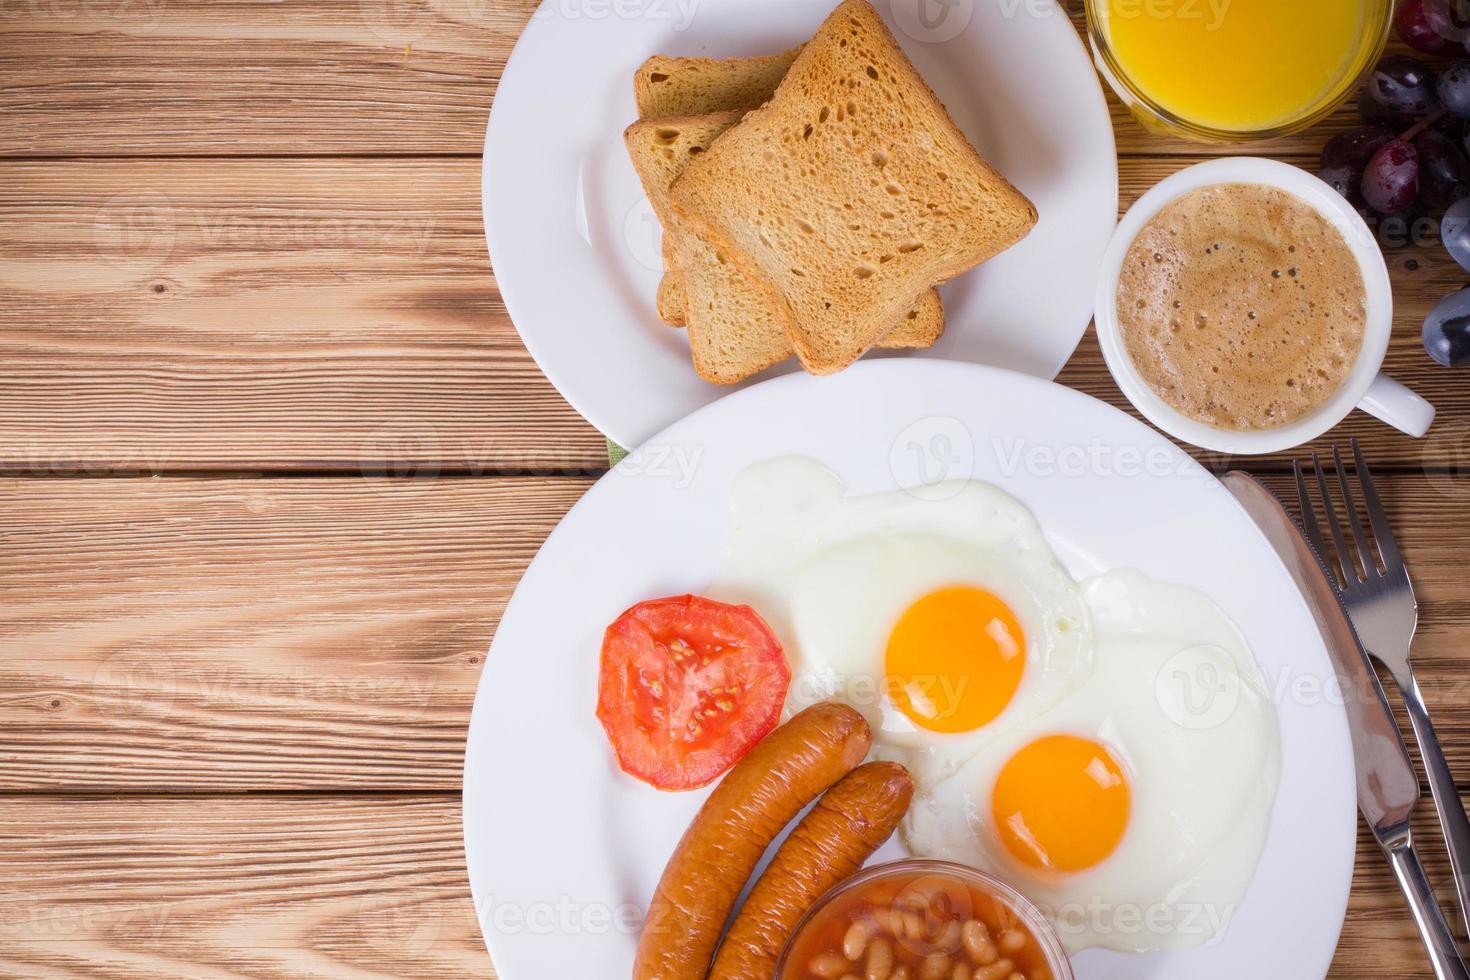 petit-déjeuner anglais complet photo